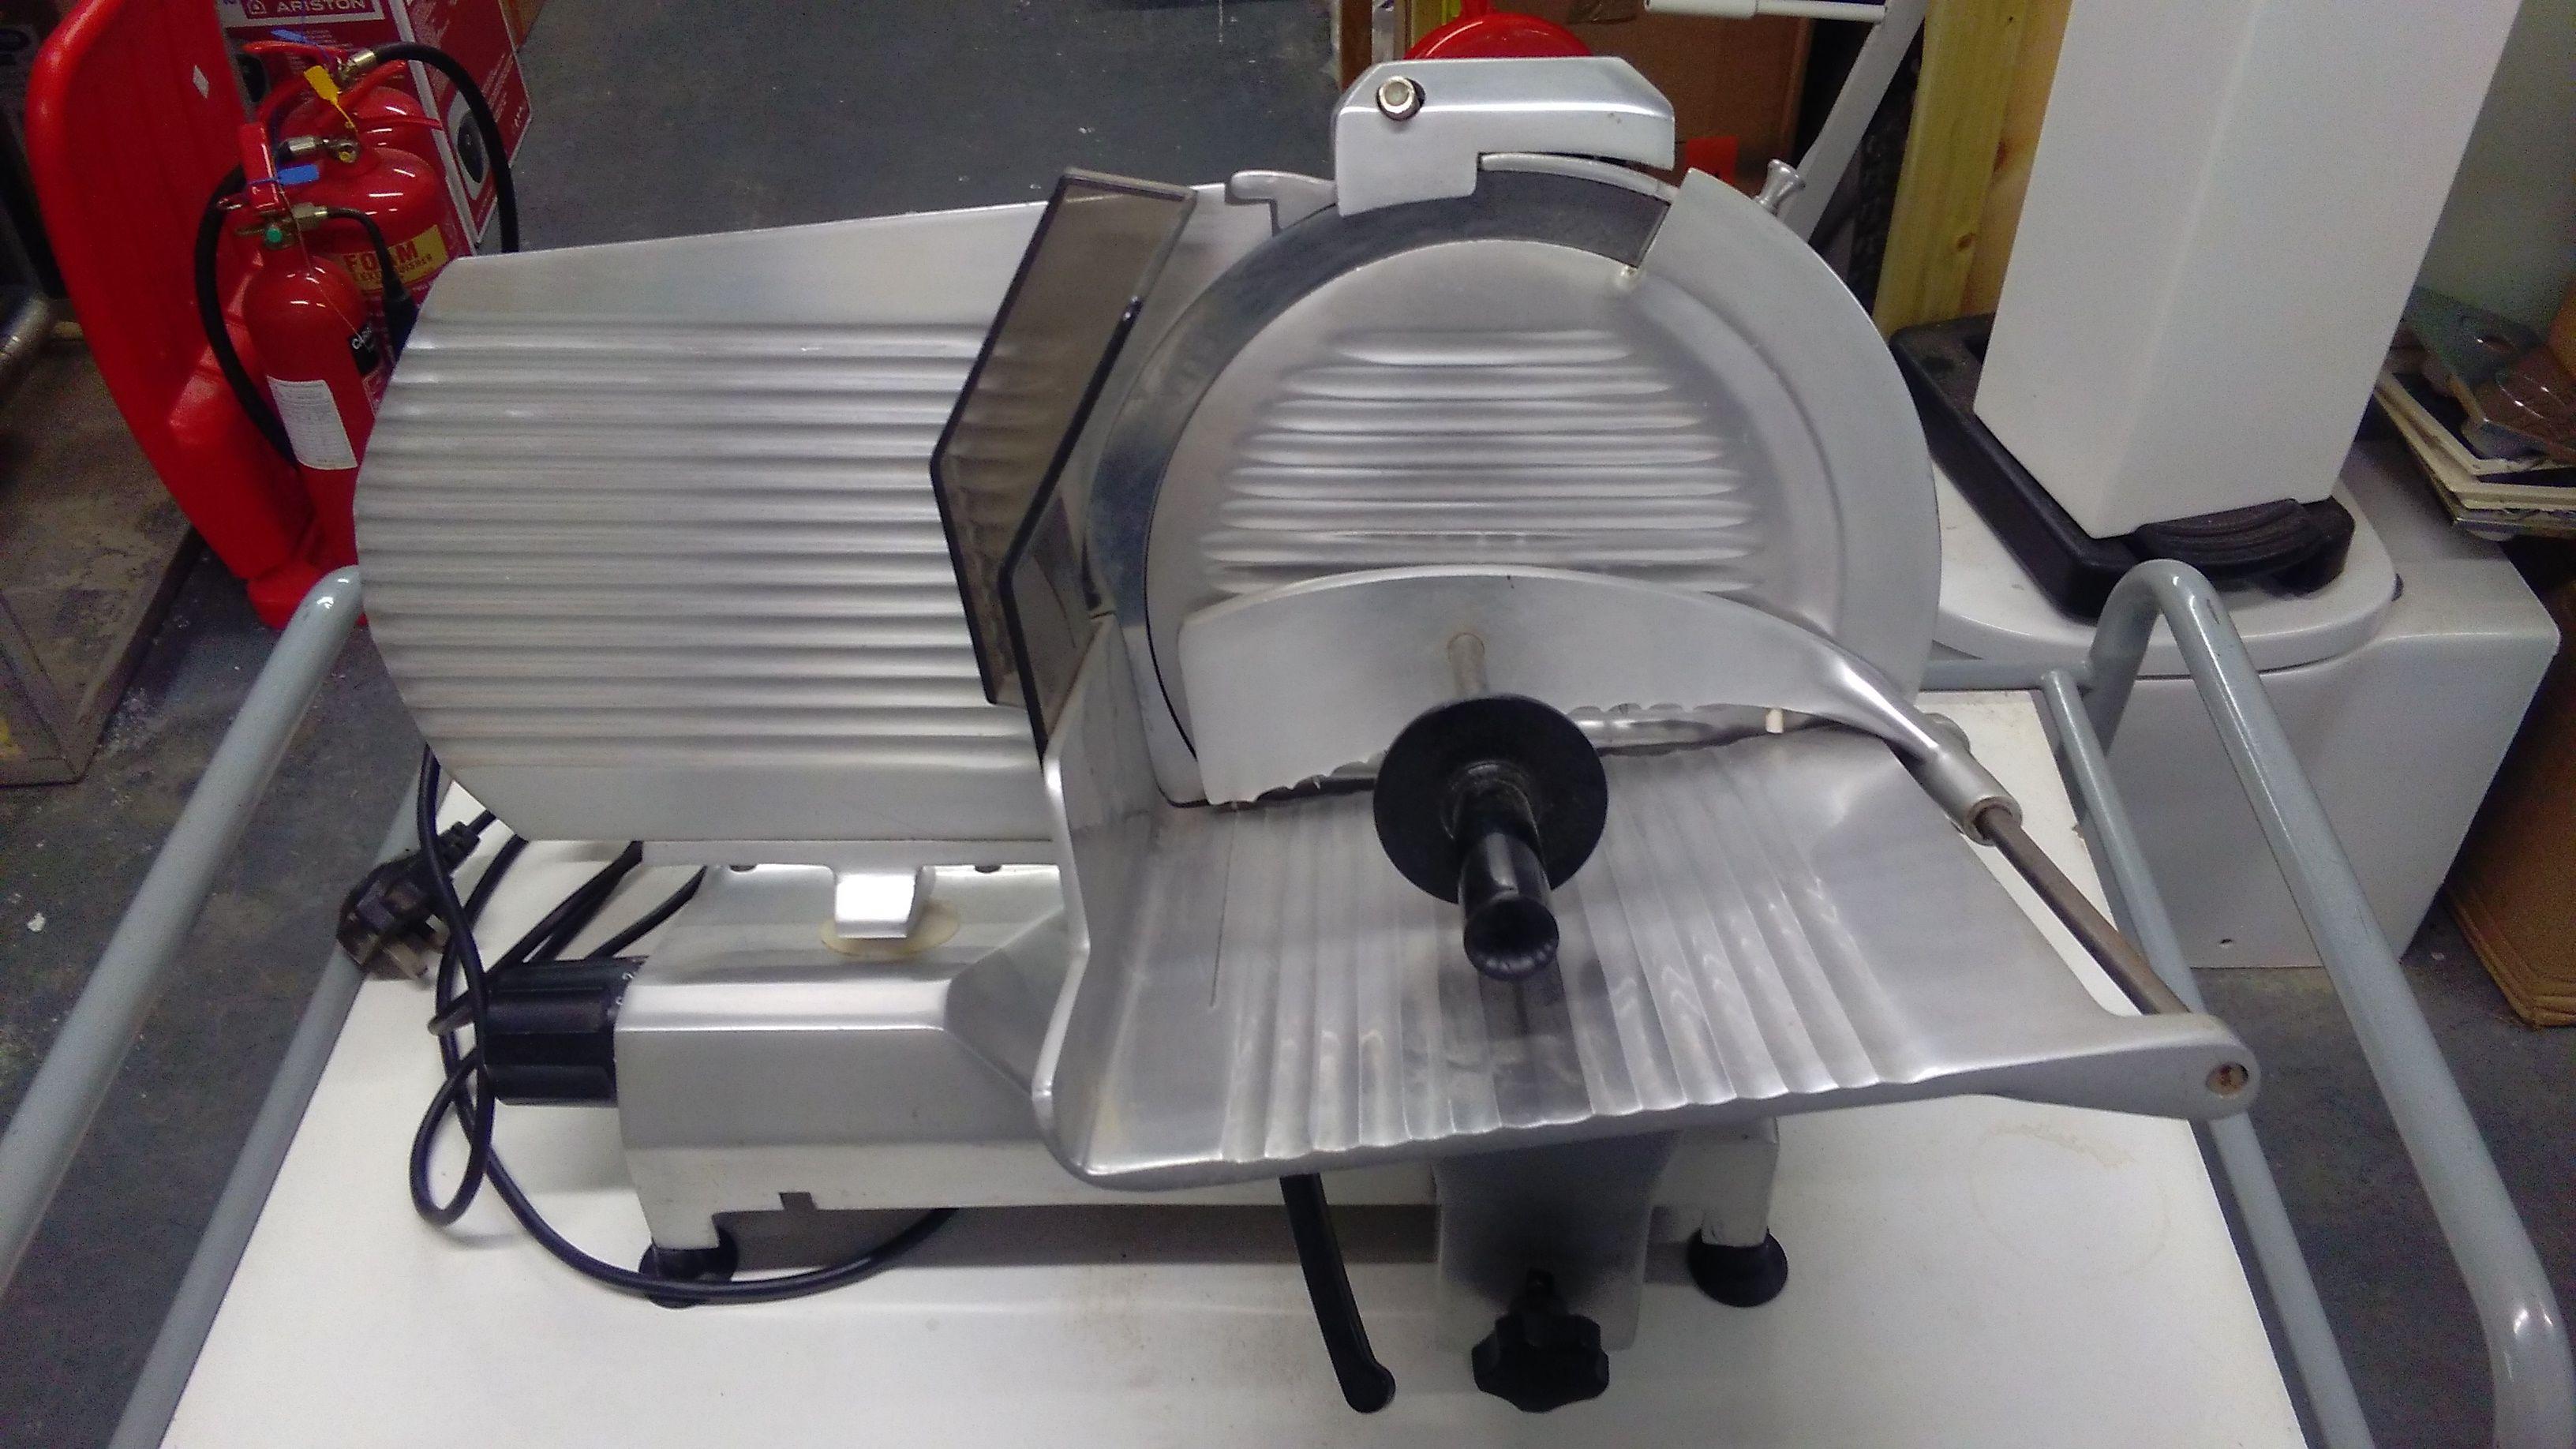 Hobart GLT-300 300mm Gravity Feed Commercial Meat Slicer